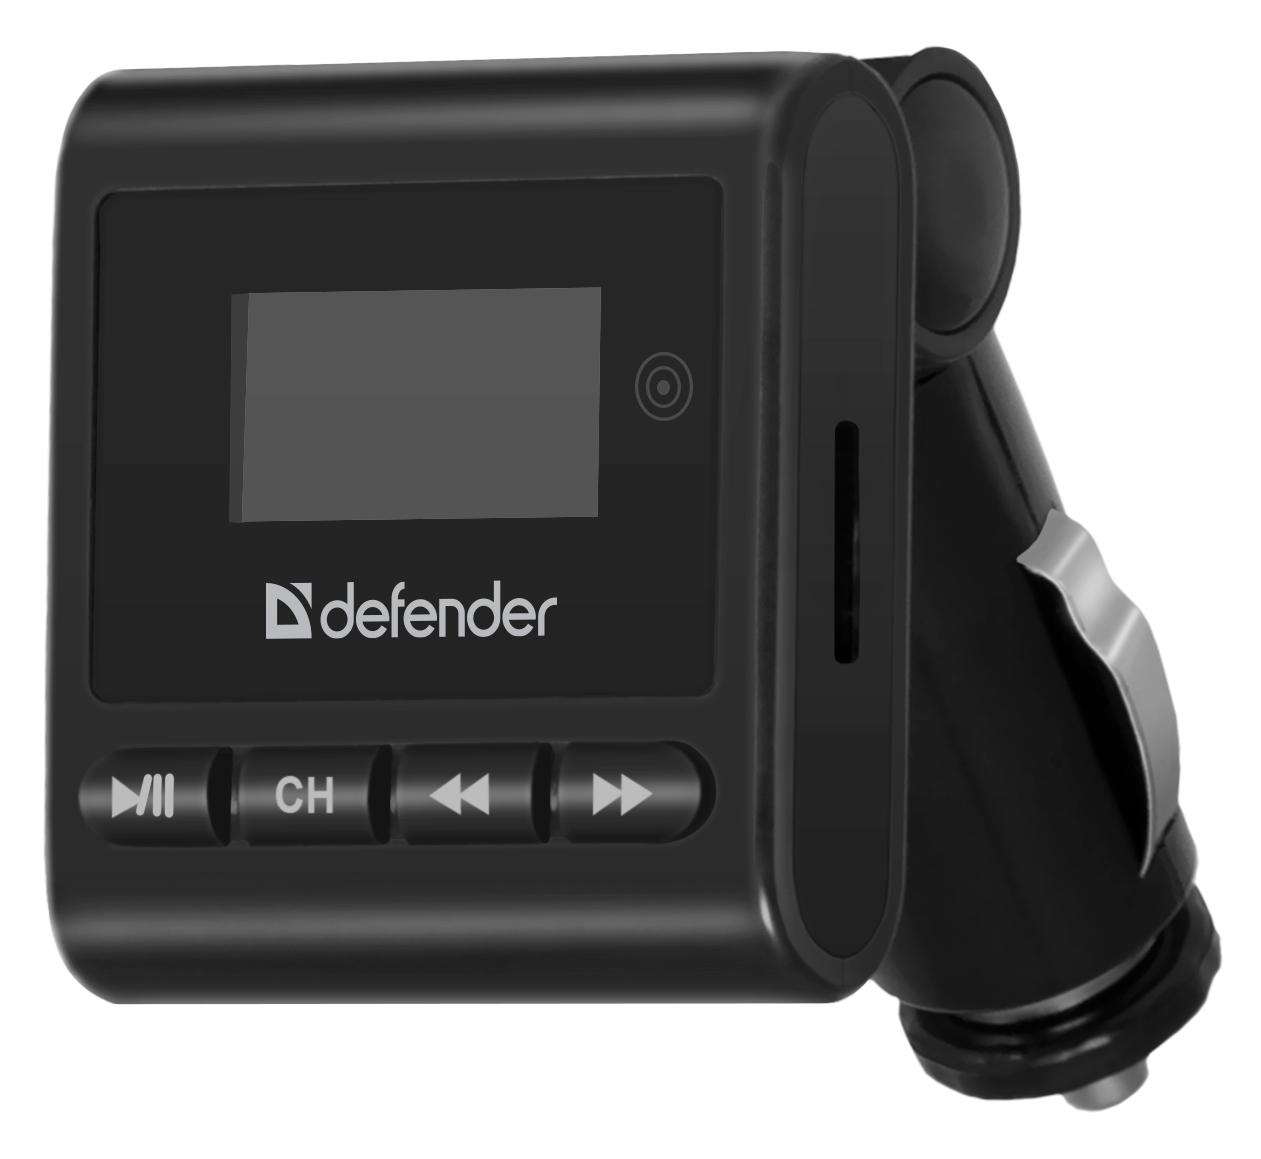 FM-модулятор/трансмиттер Defender RT-Basic, черный